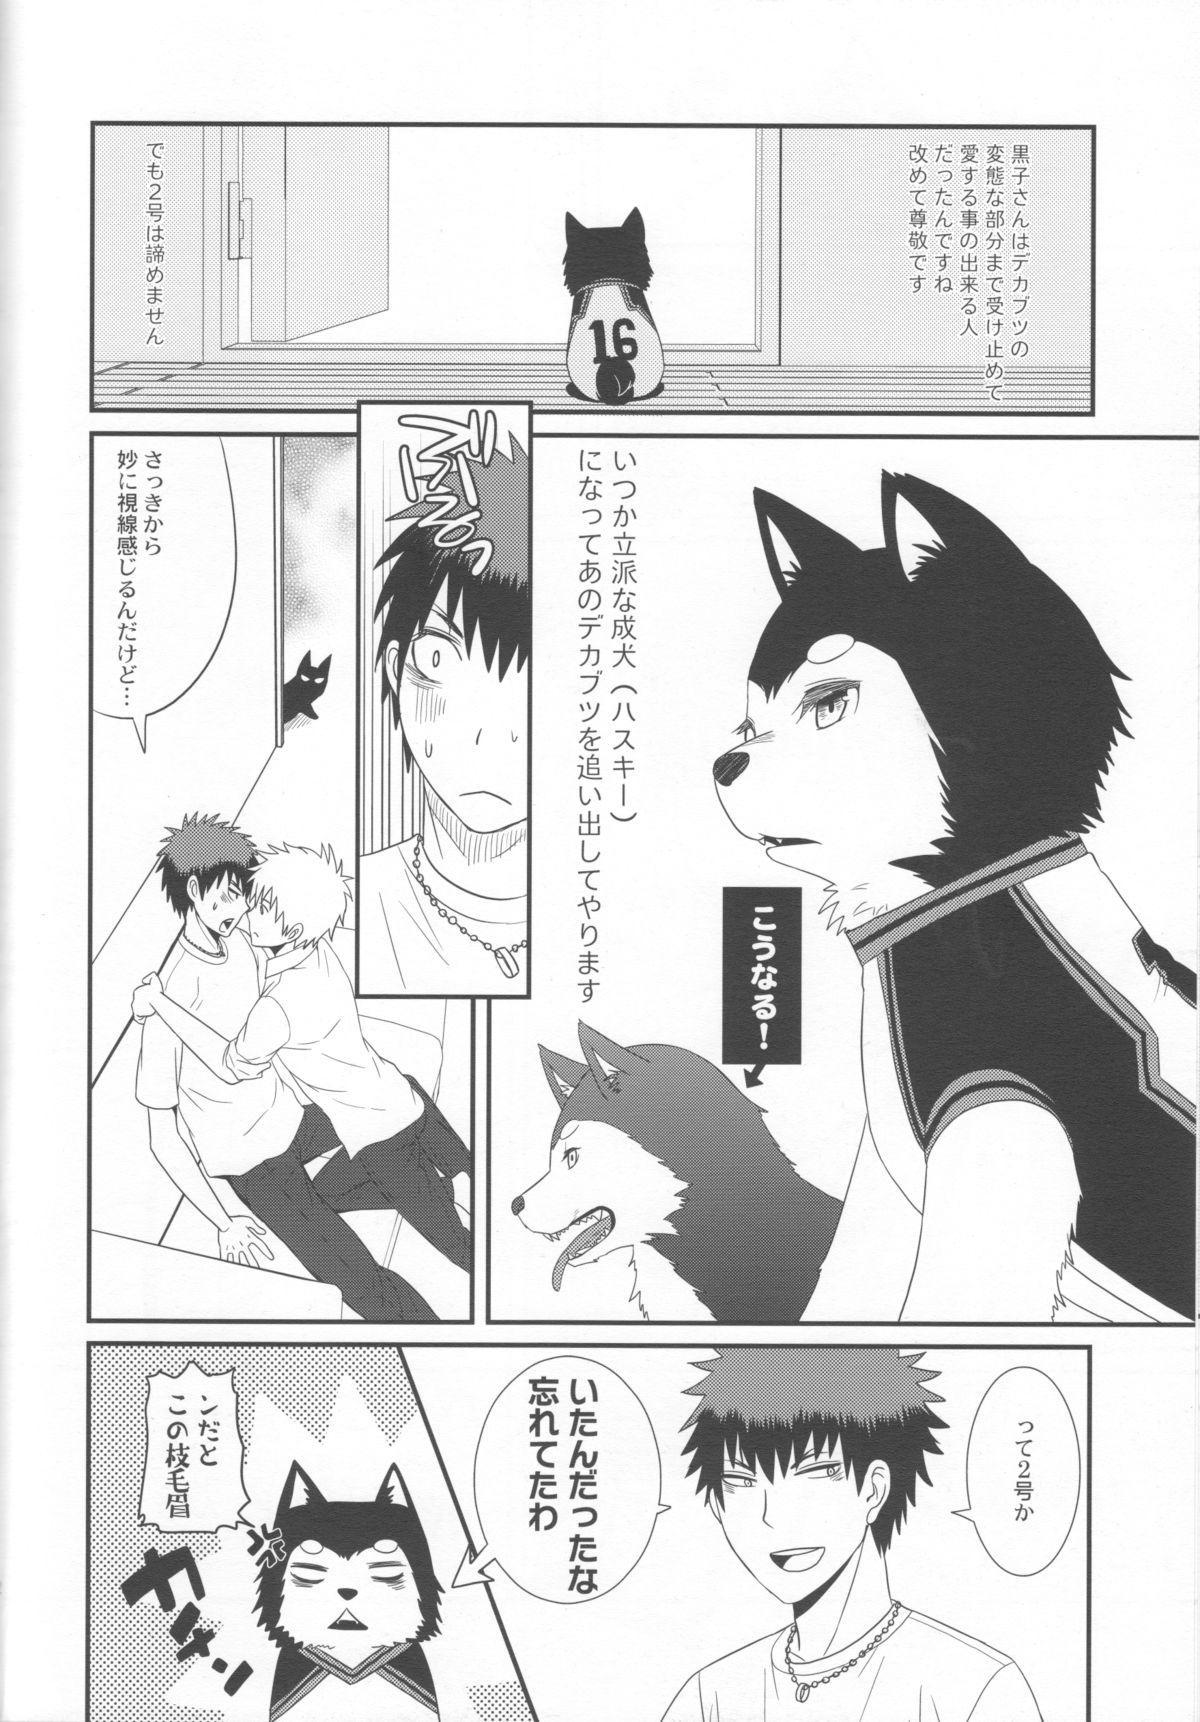 Kuroko to Kagami to Tokidoki Nigou to 30